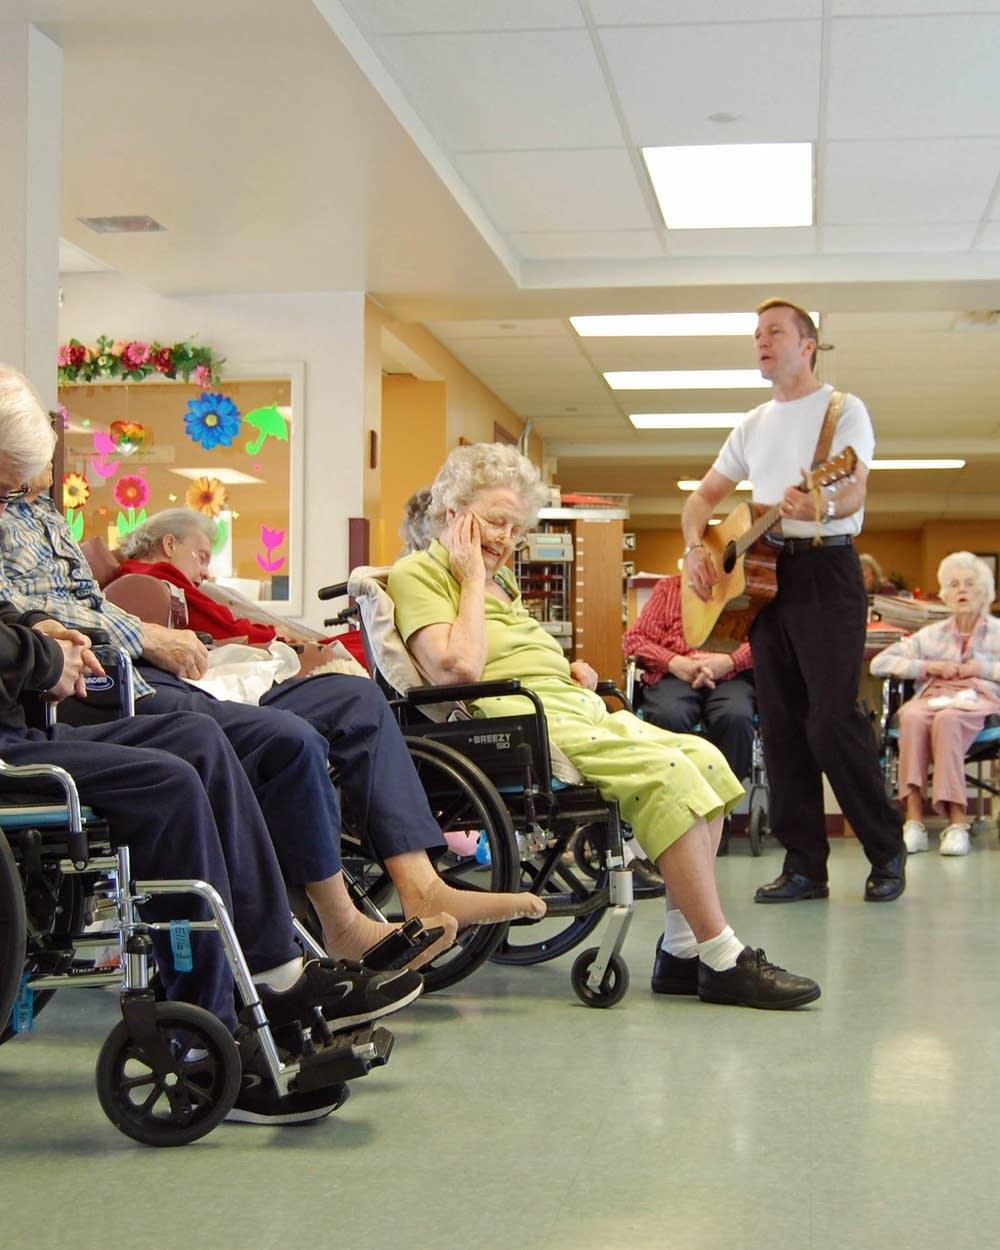 Minnesota S Nursing Homes Face Financial Crisis Mpr News